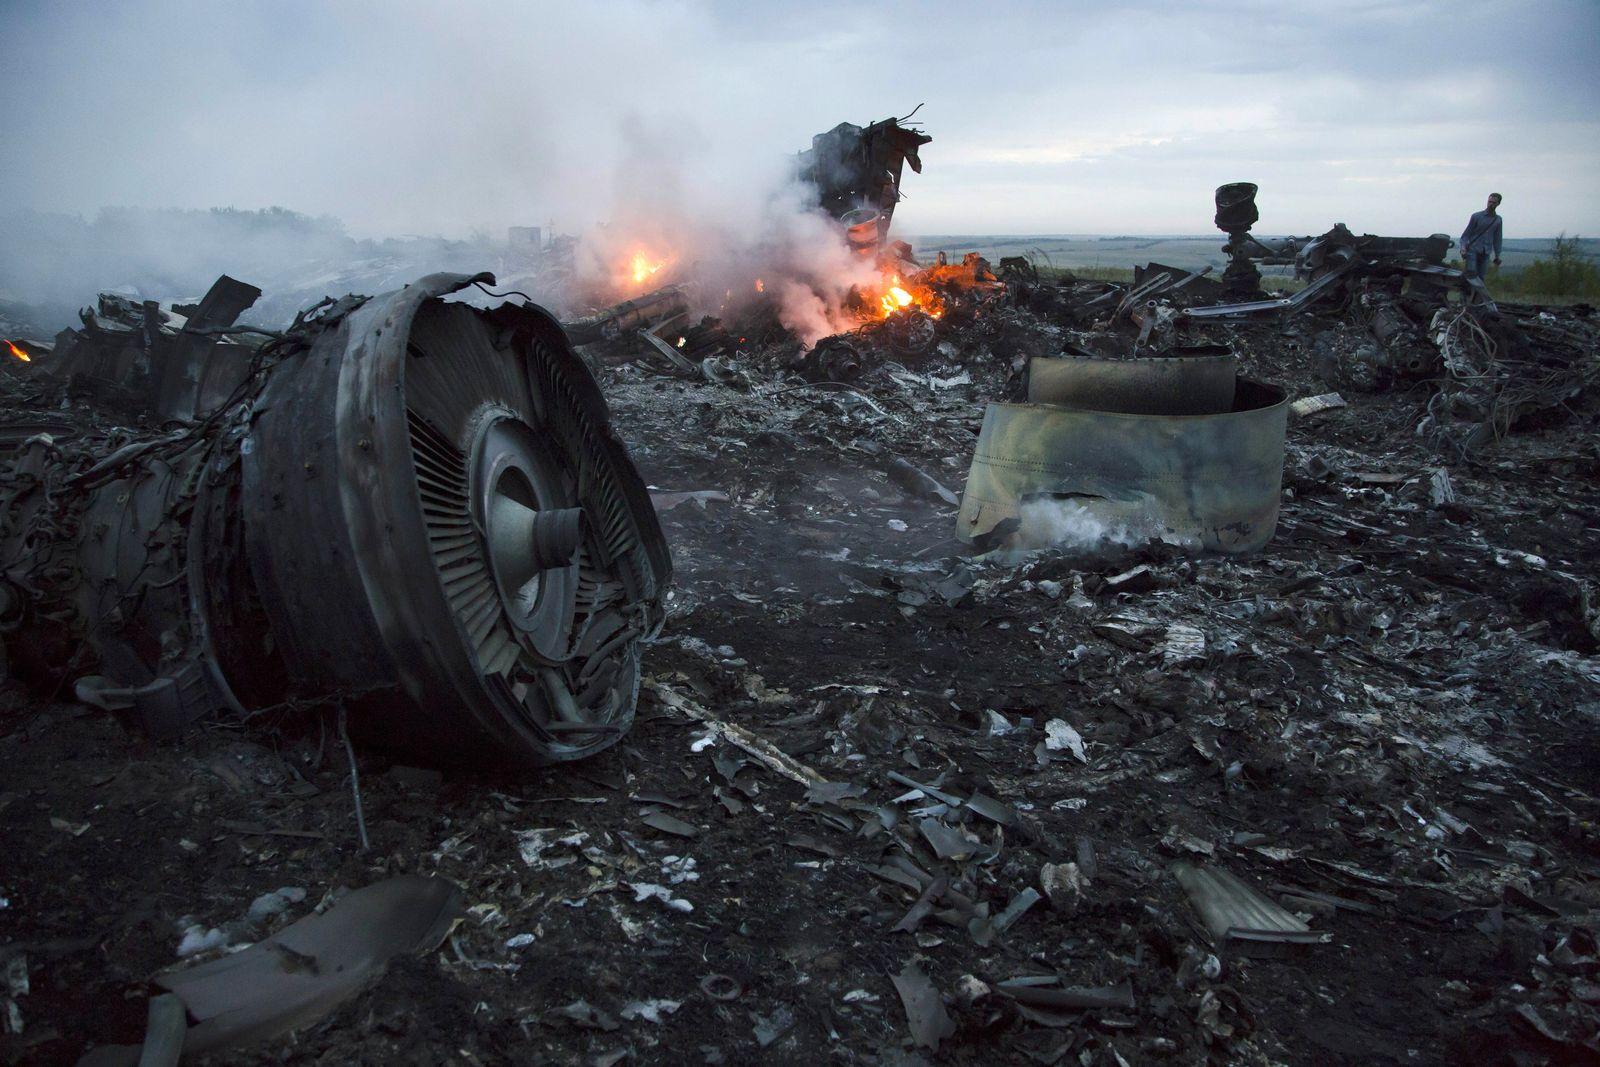 MH17 Hrabove Ukraine